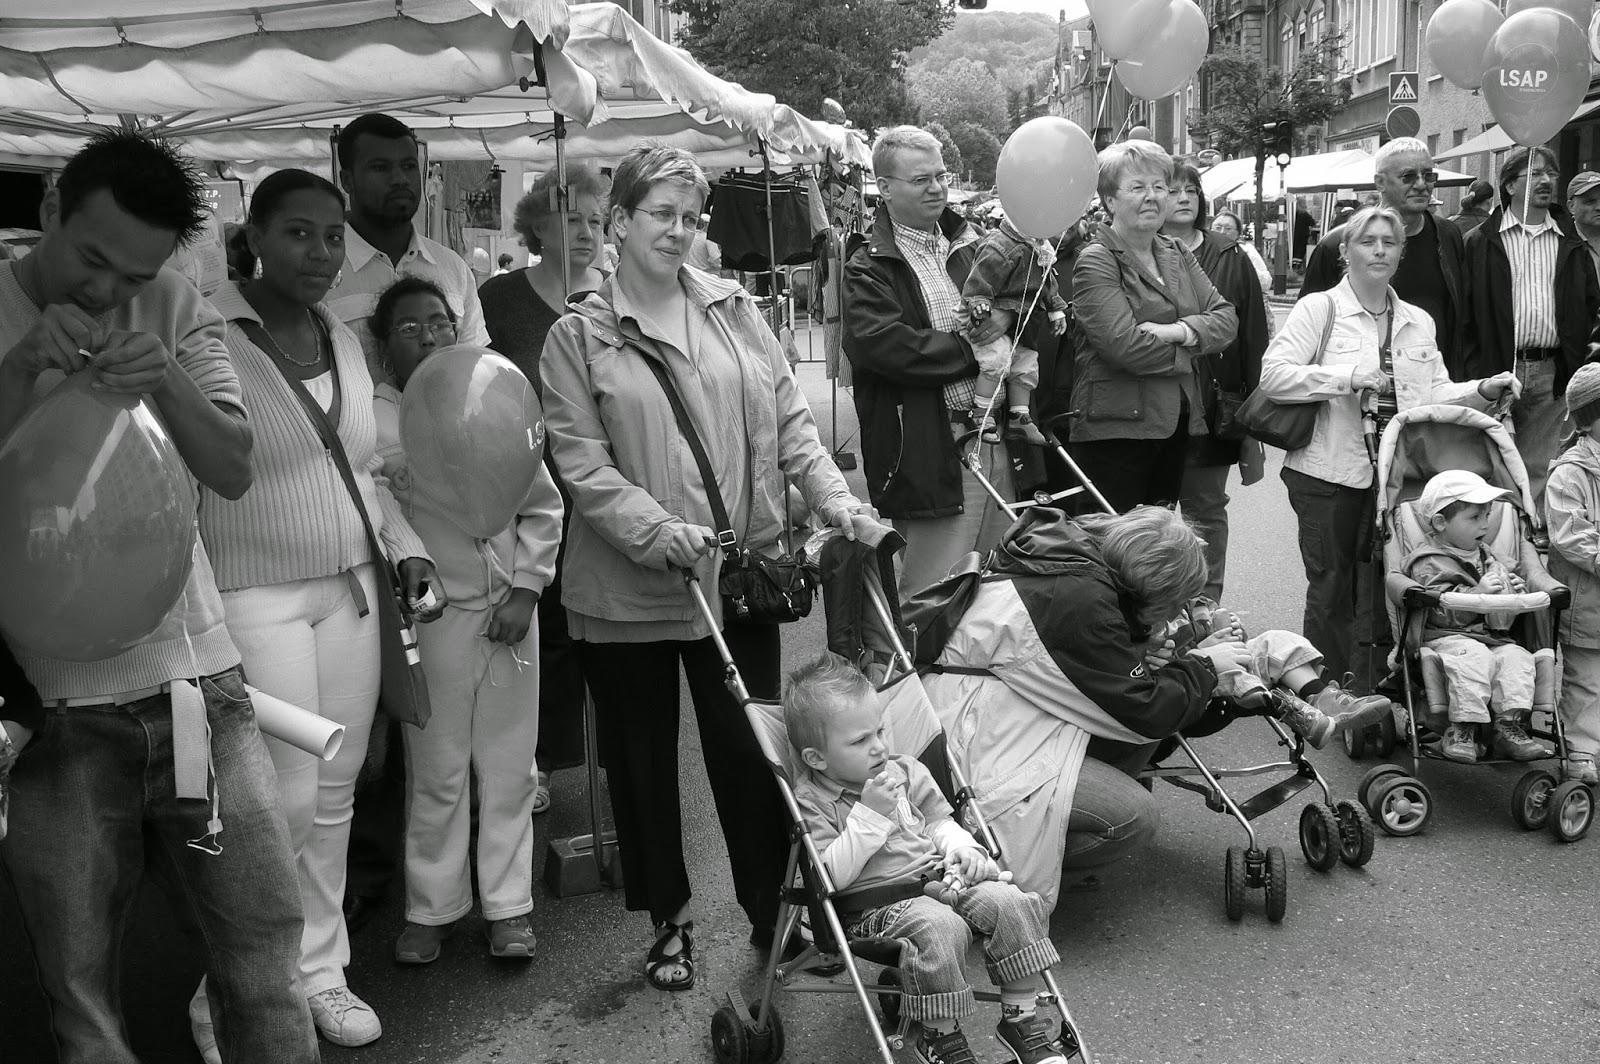 italien asylanten besetzen häuser